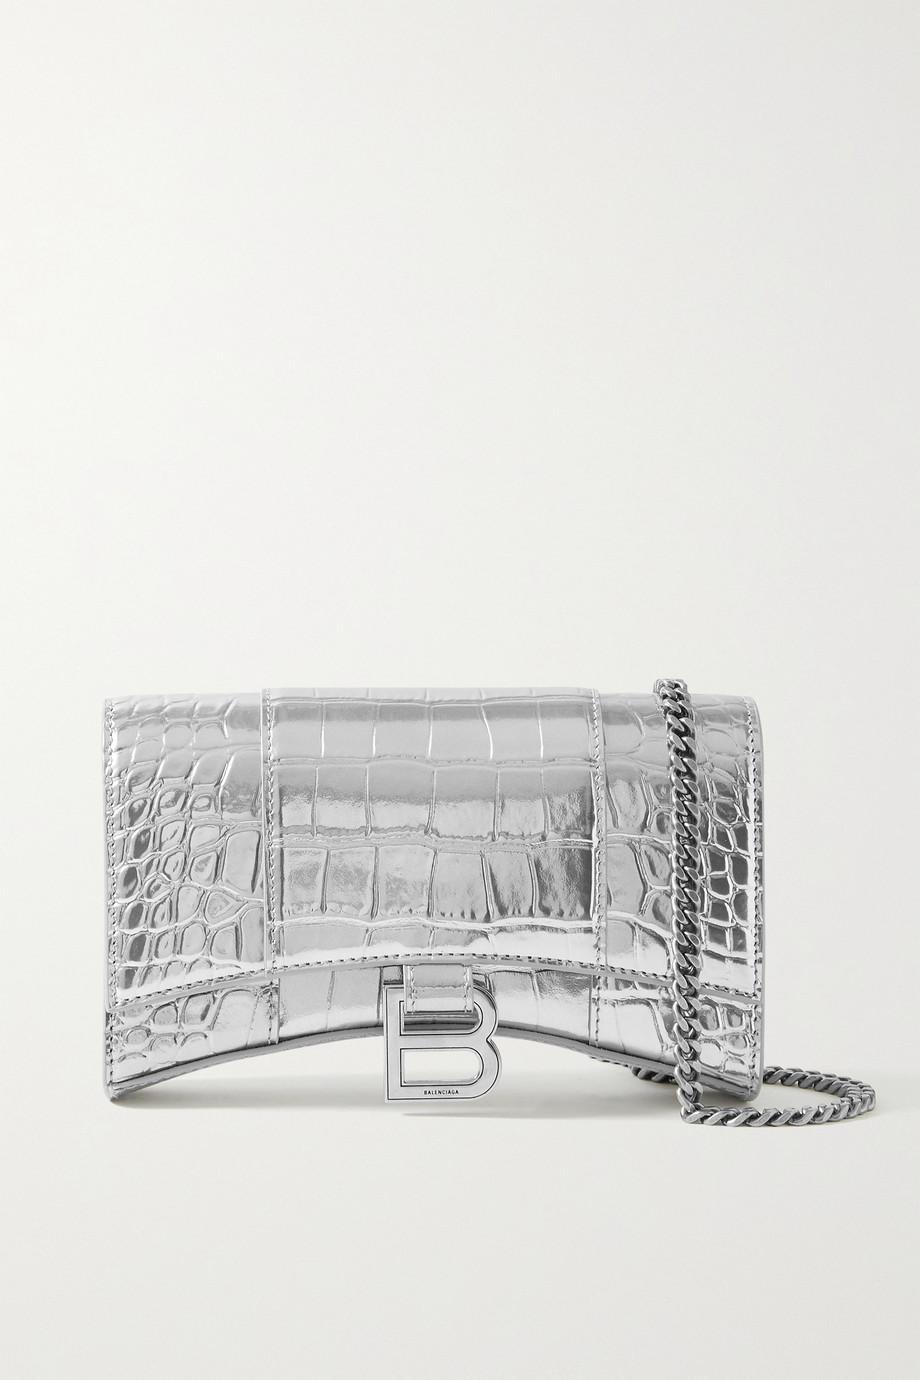 Balenciaga Sac porté épaule en cuir effet croco métallisé Hourglass XS